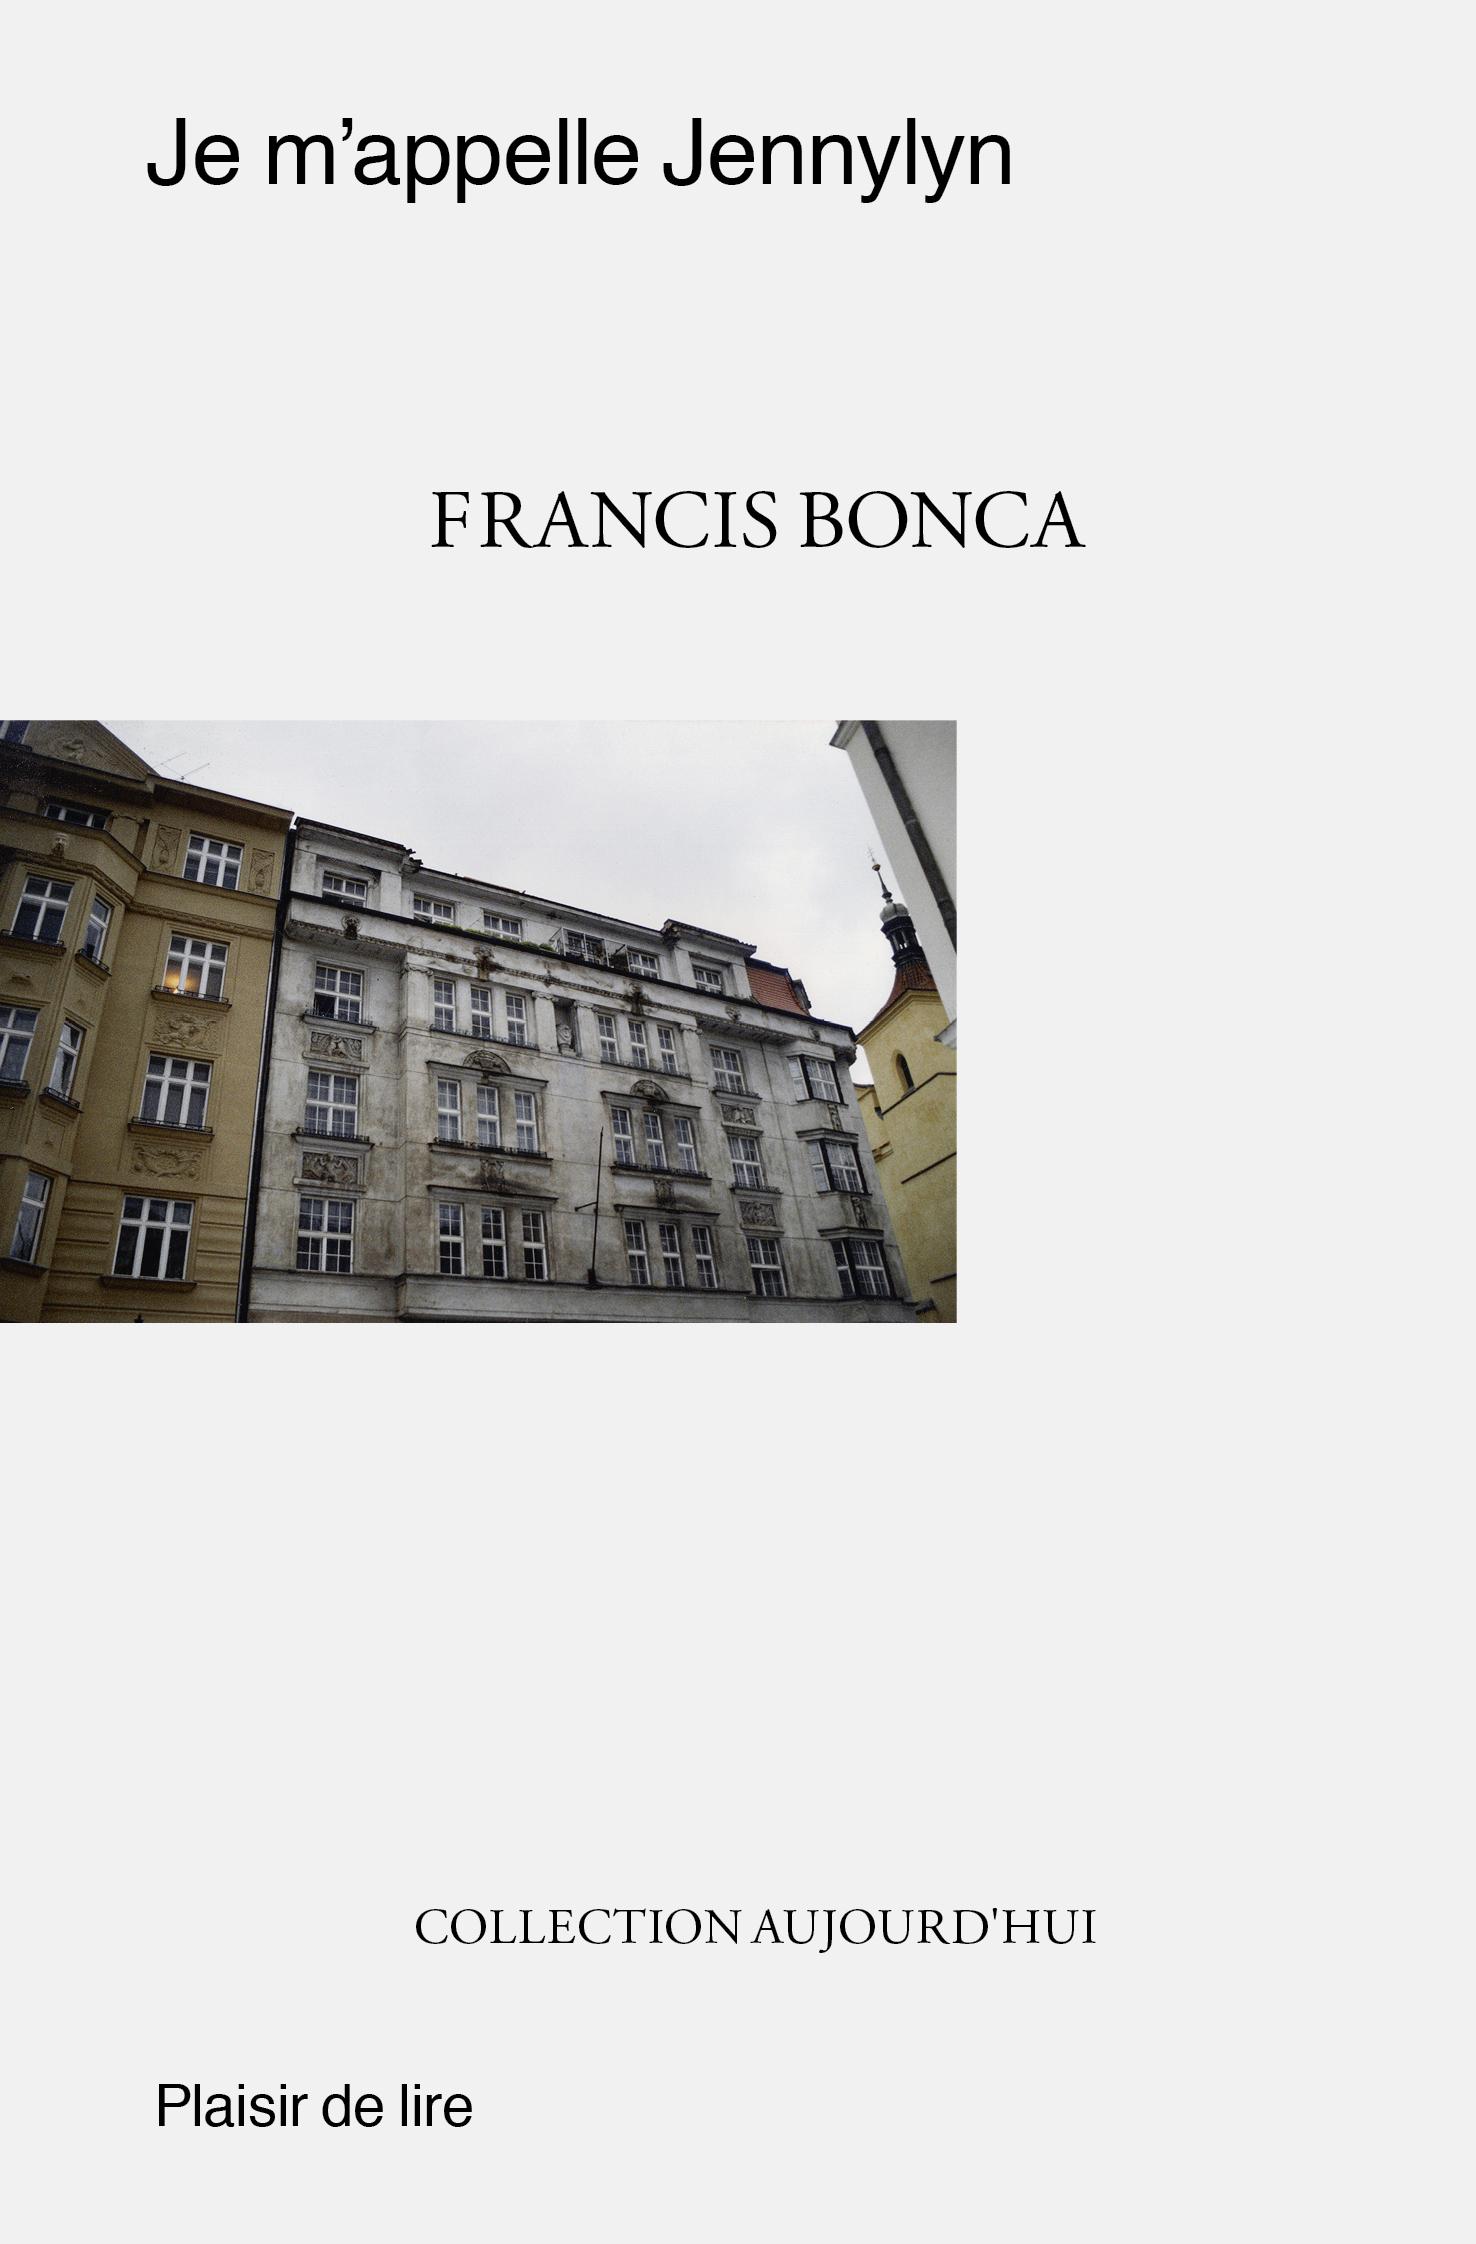 PDL_couv-livre_Francis-Bonca-Je-mappelle-Jennylyn